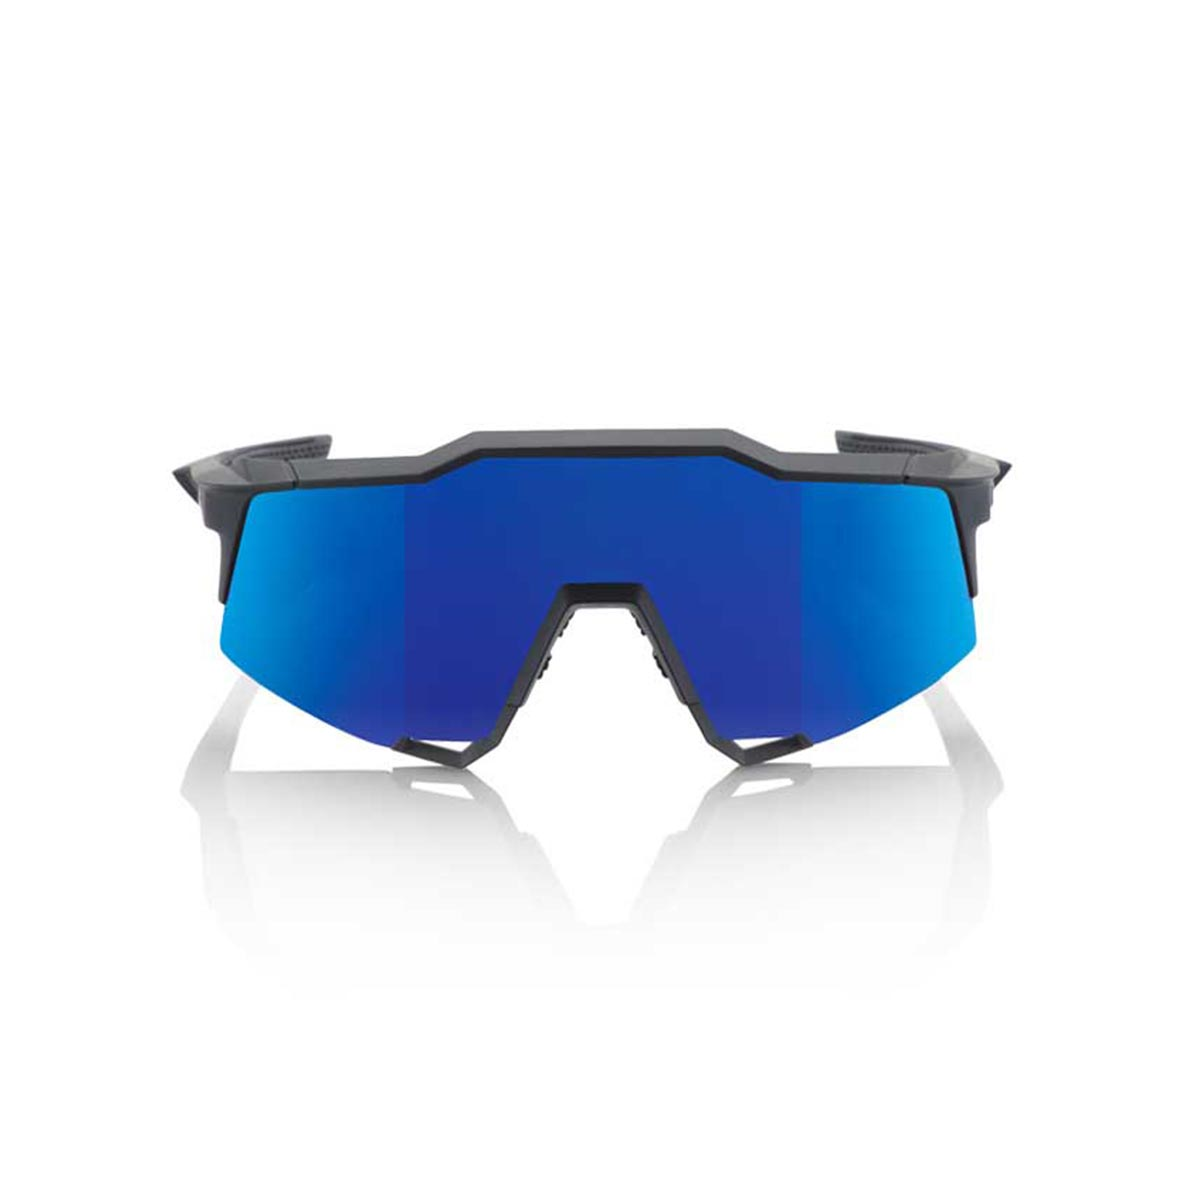 cdc617e80a Speedcraft - Soft Tact Black - Ice Mirror - Pure Endurance